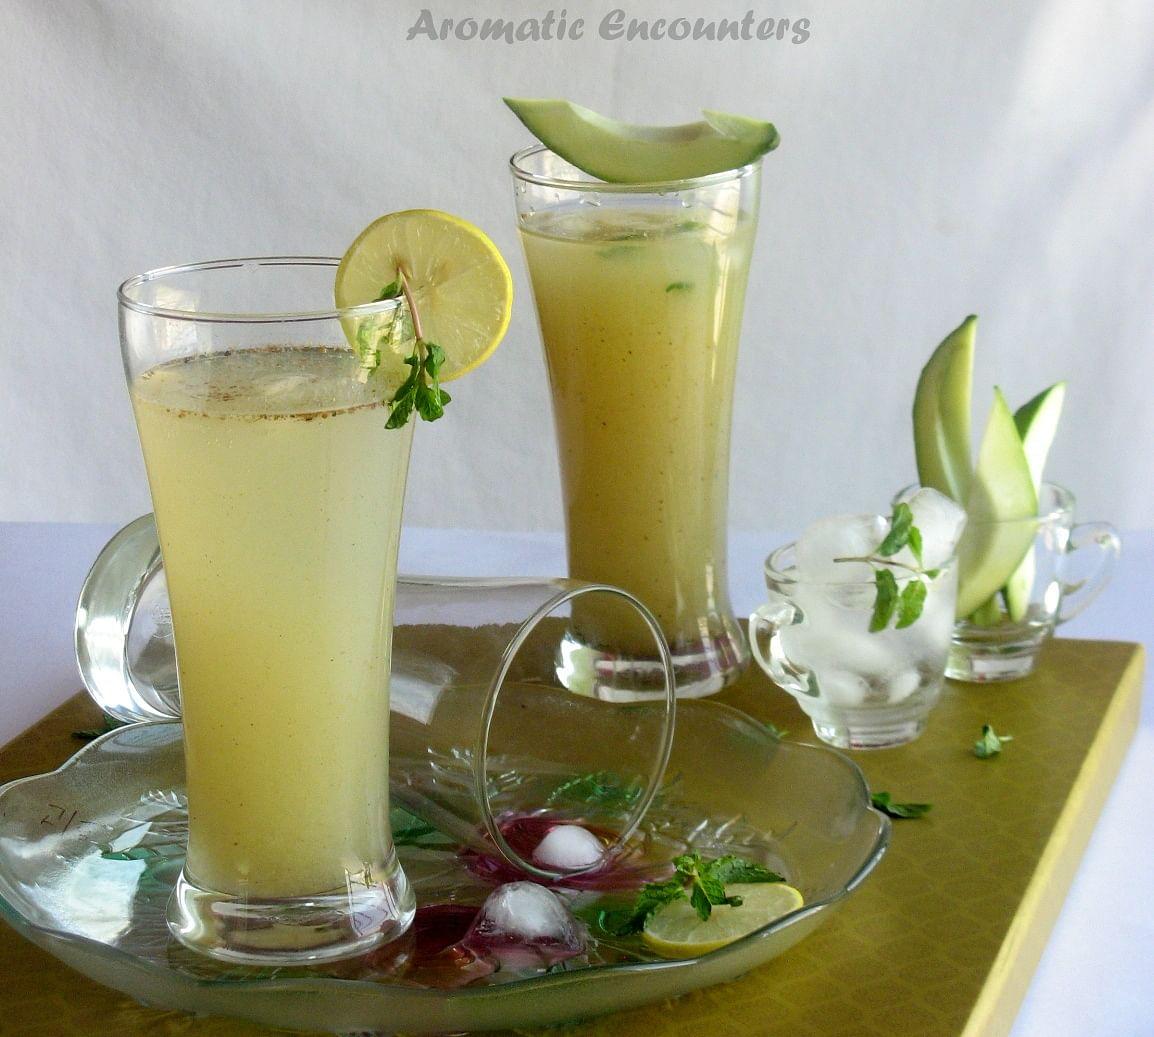 Pic Courtesy: aromaticencounters.wordpress.com